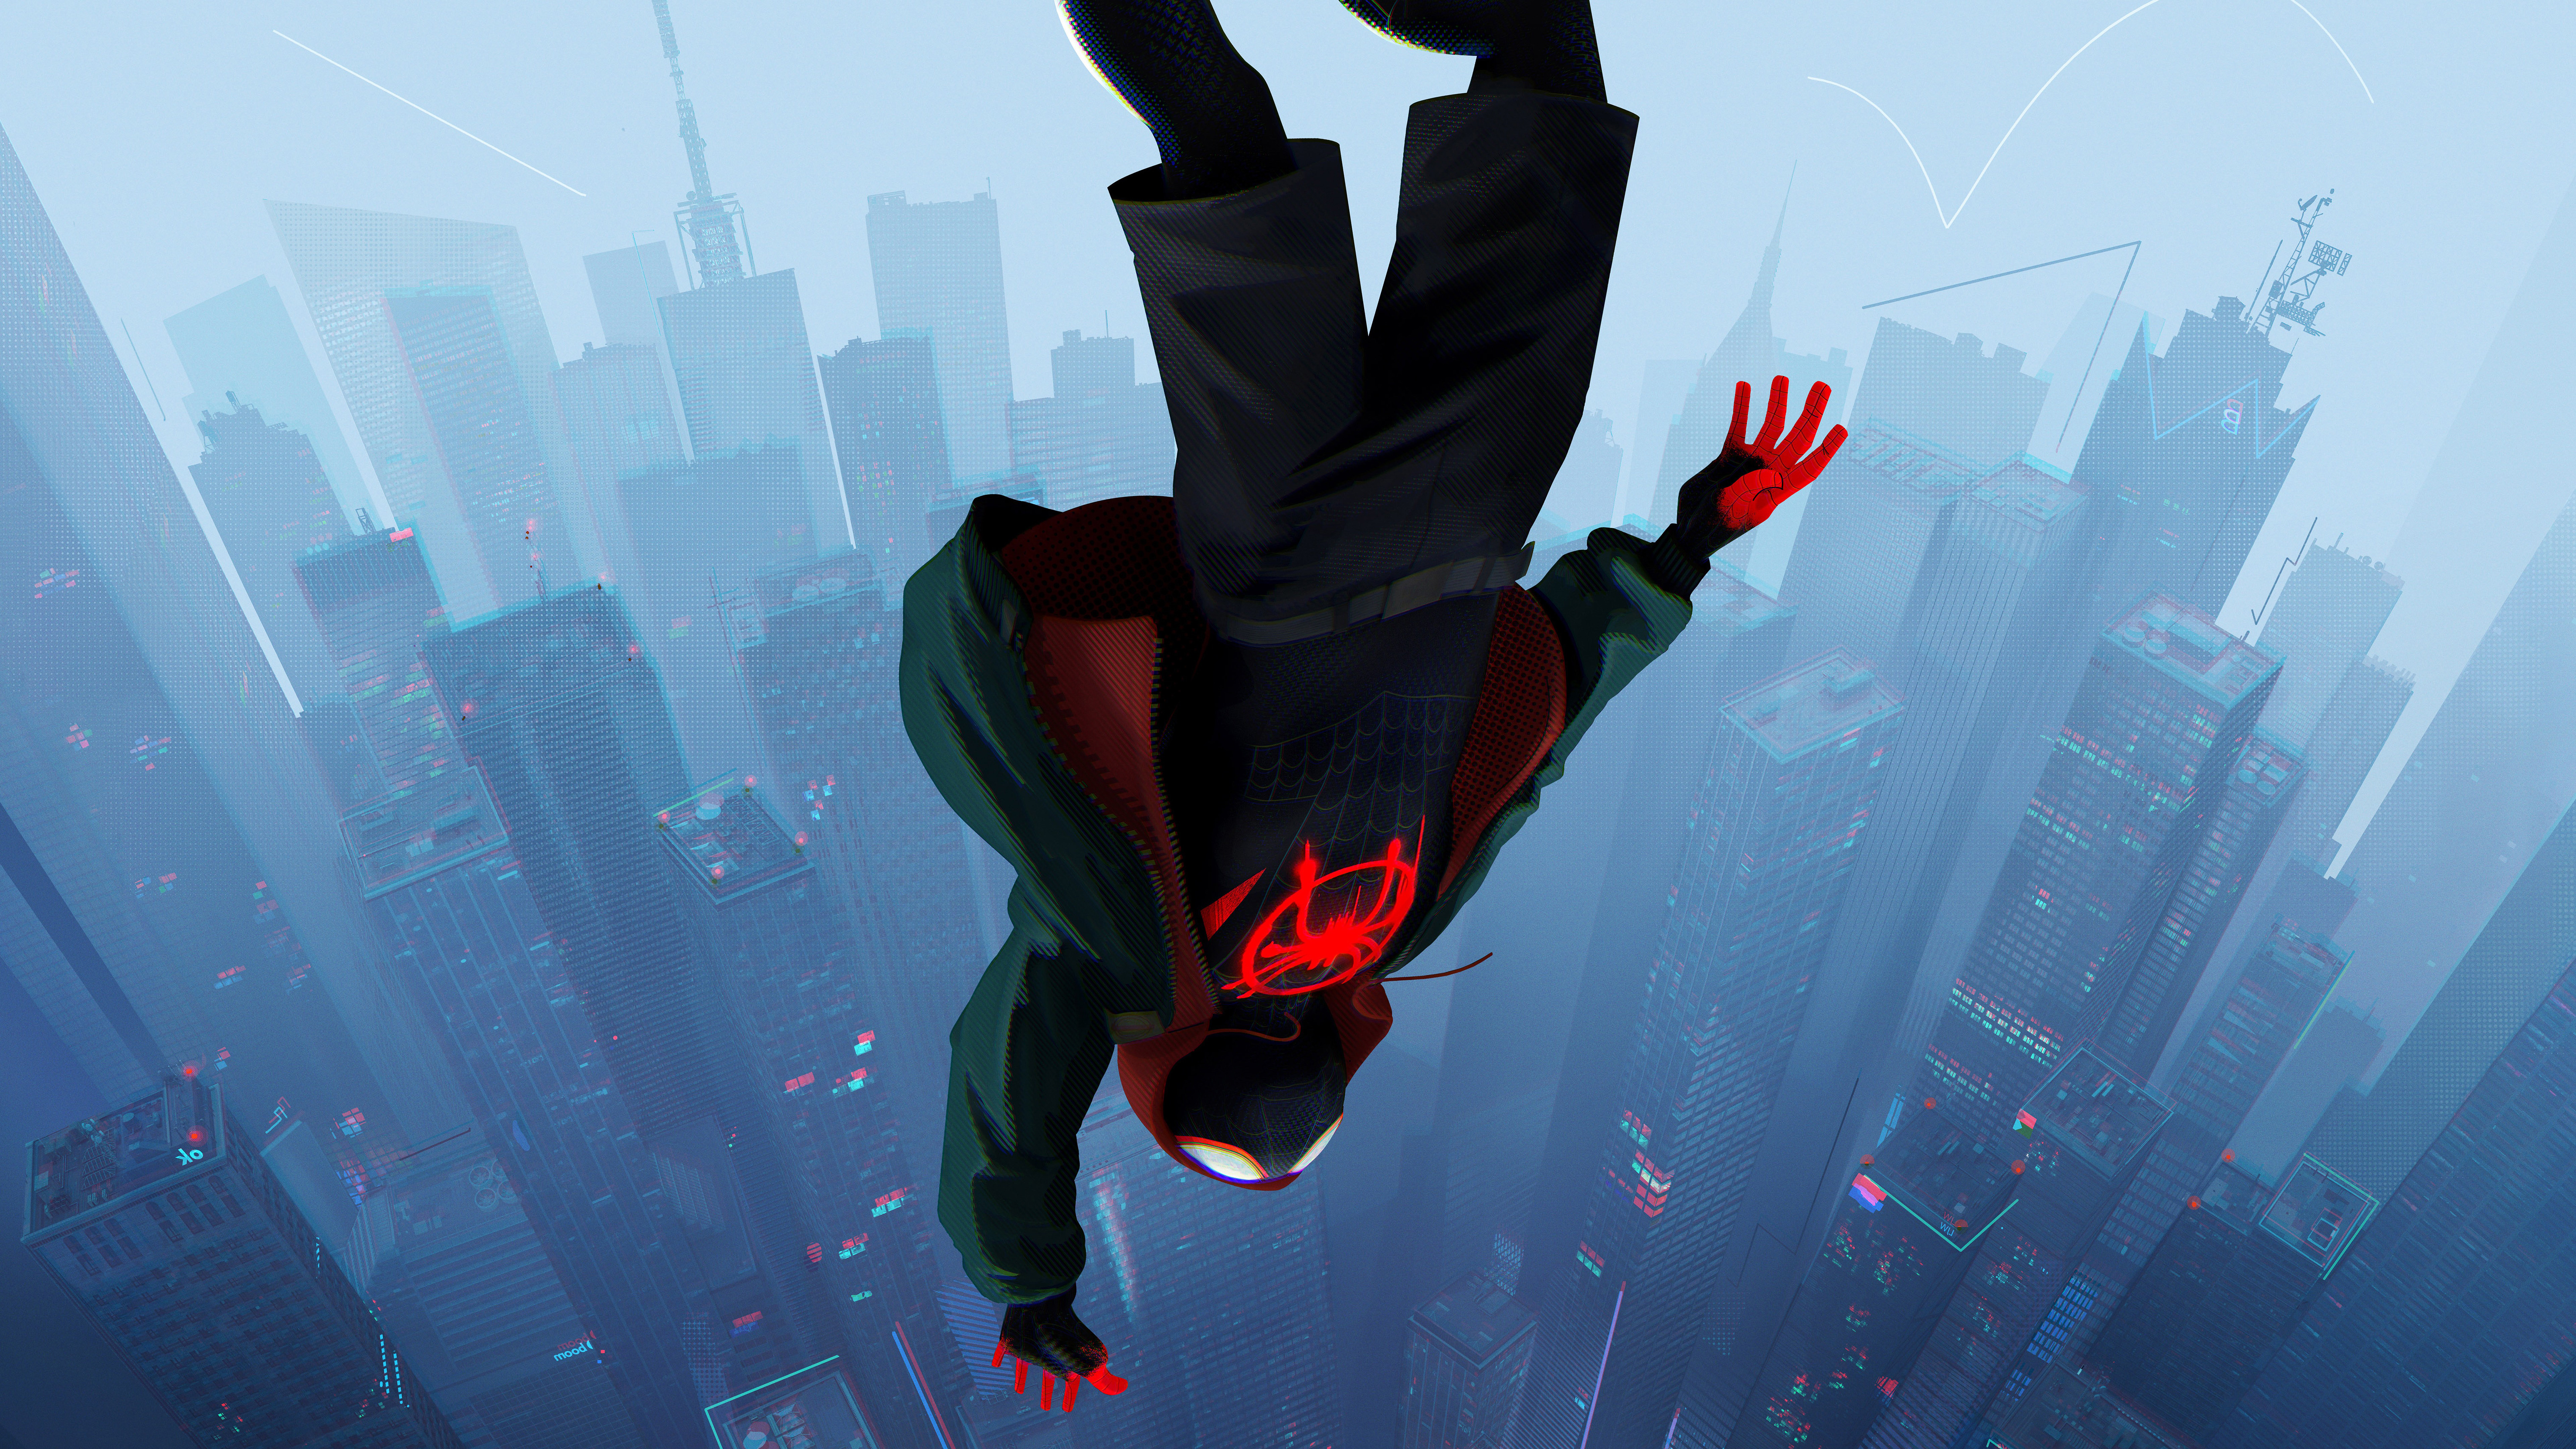 Spiderman Into The Spider Verse Movie 2018 8k Hd Movies 4k